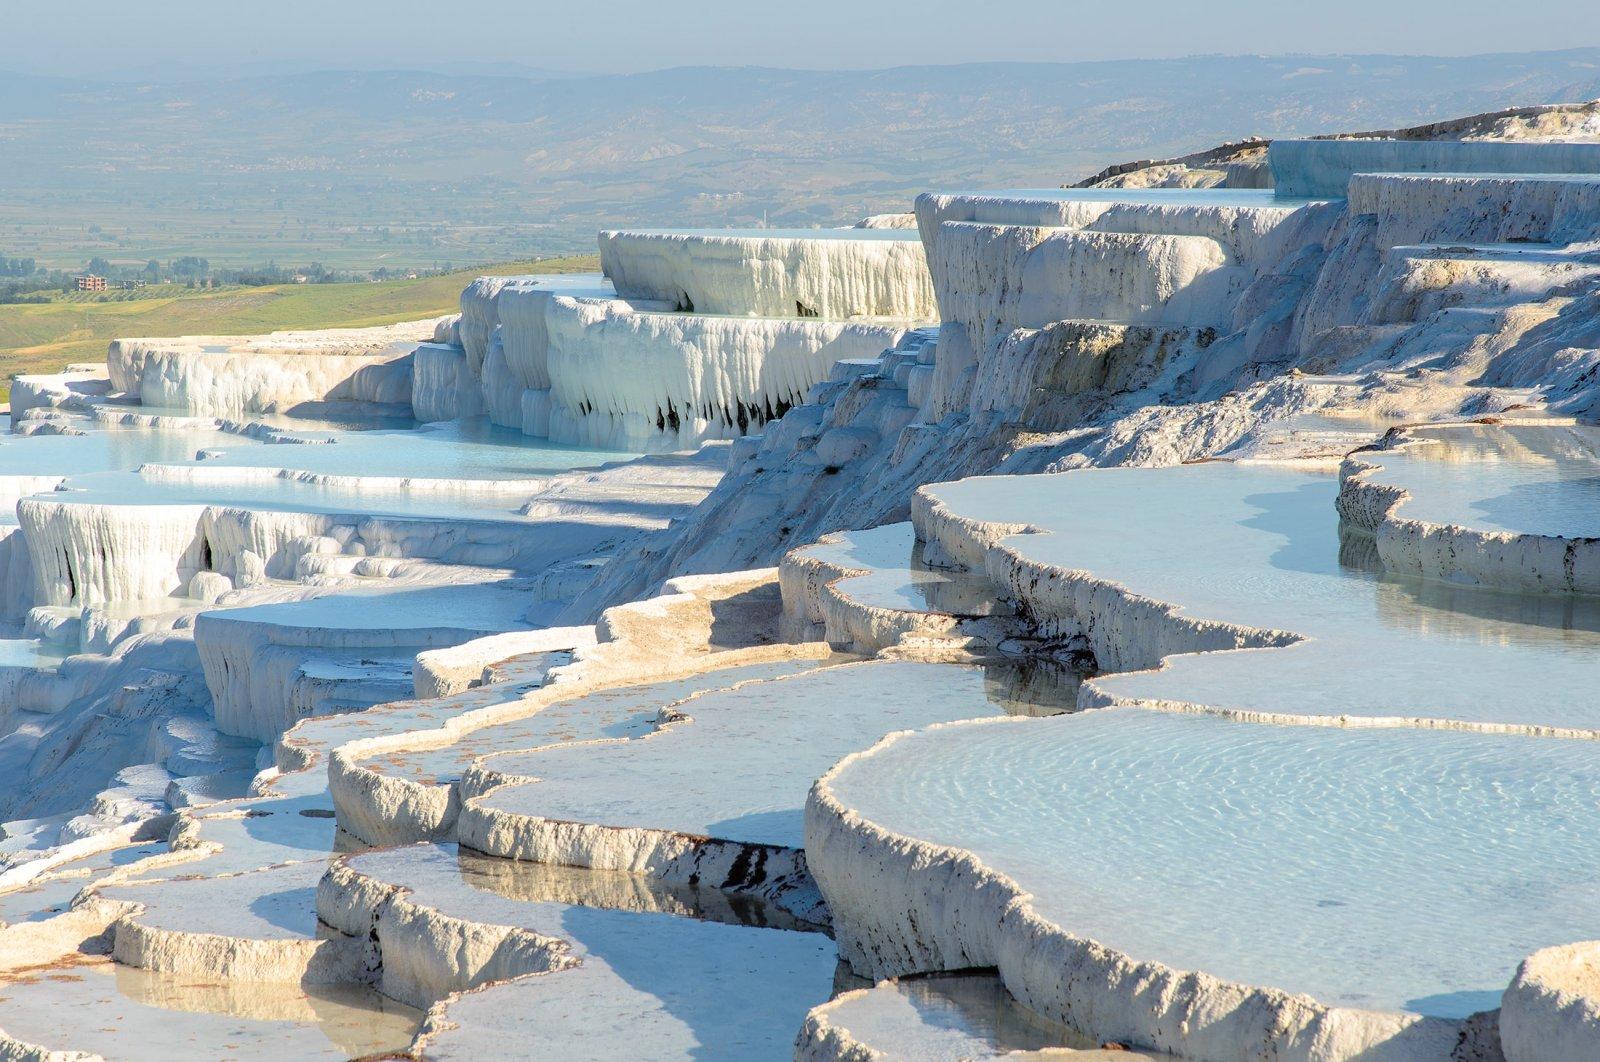 The view of thermal baths in Denizli's Pamukkale in Turkey. (Shutterstock Photo)